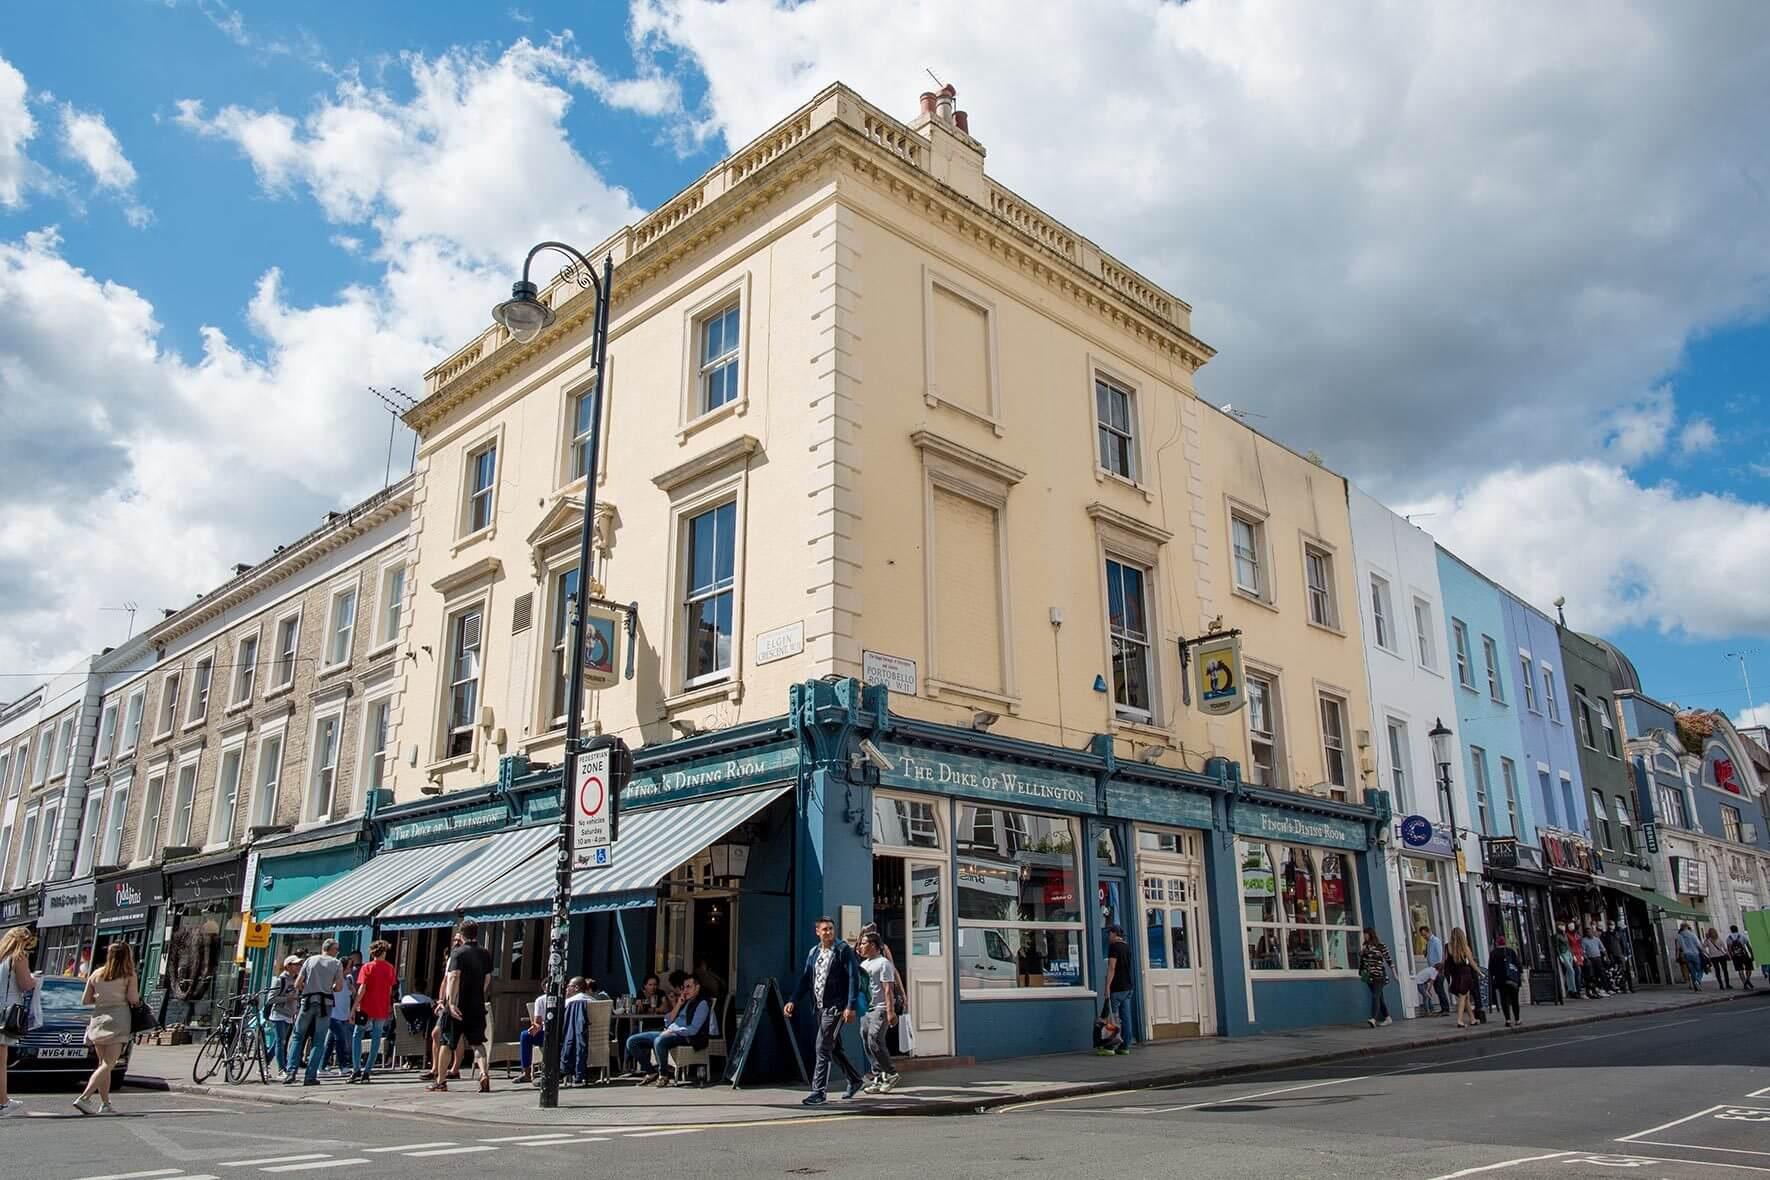 Notting Hill Ladbroke Grove the duke of wellington - notting hill - thursday night pub quiz